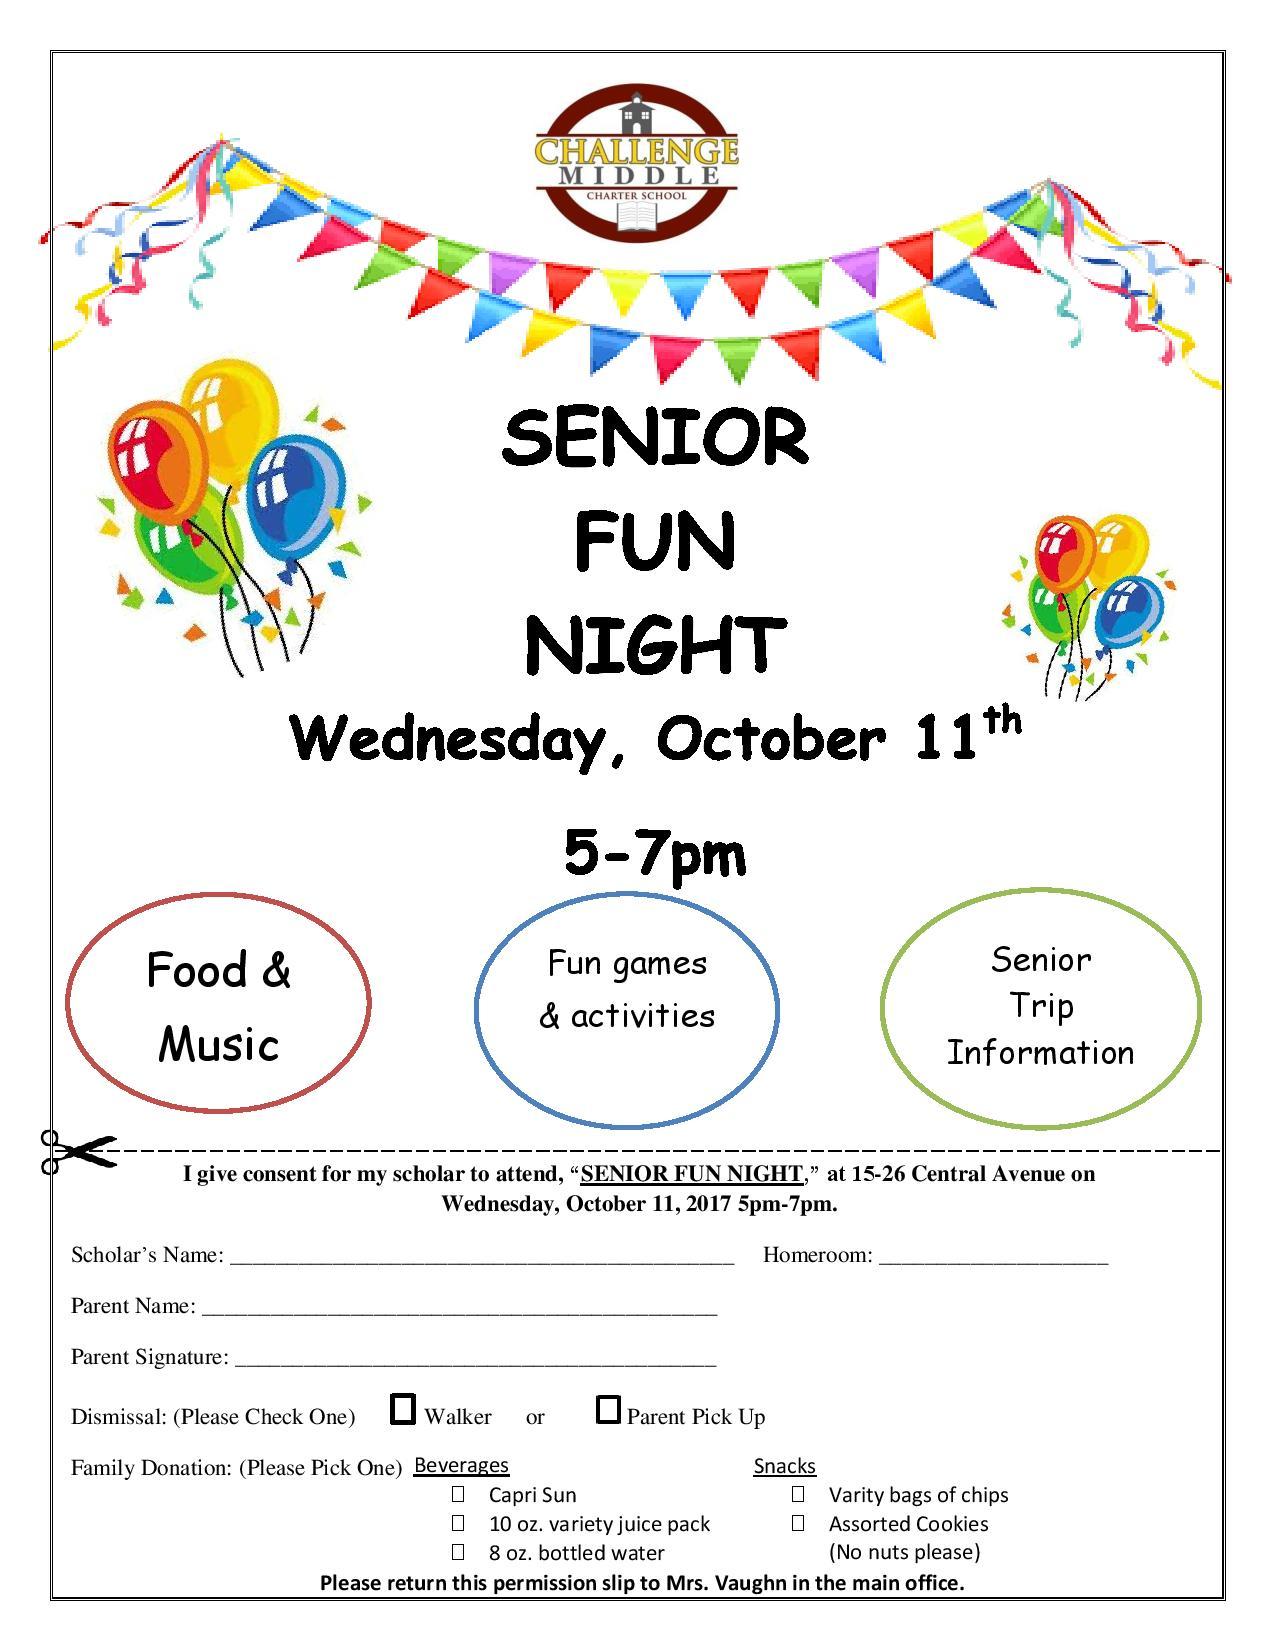 Senior Night Form